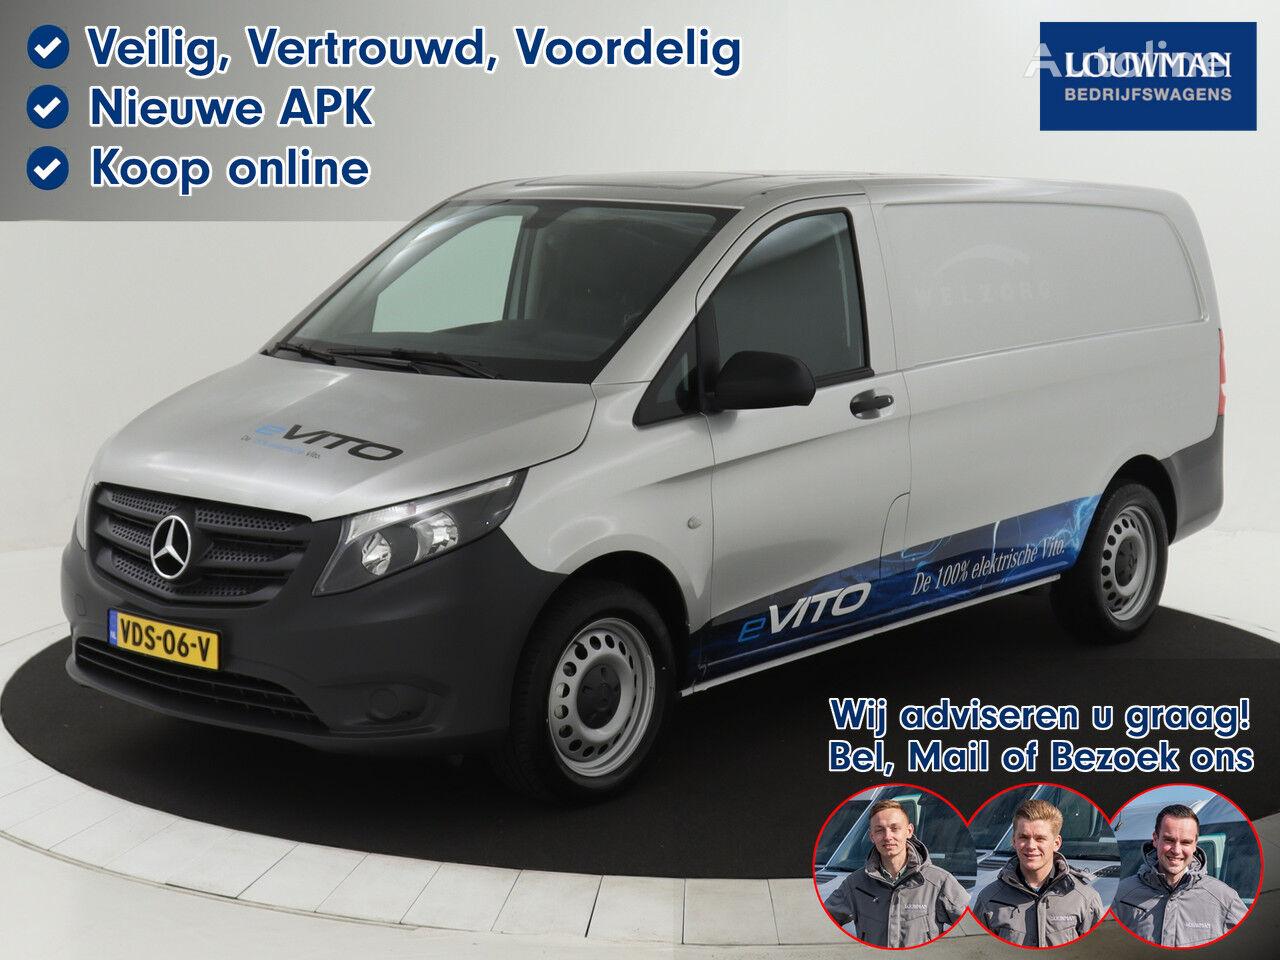 микроавтобус фургон MERCEDES-BENZ eVito eVito Lang Launch Edition volledig elektrische Vito | airc